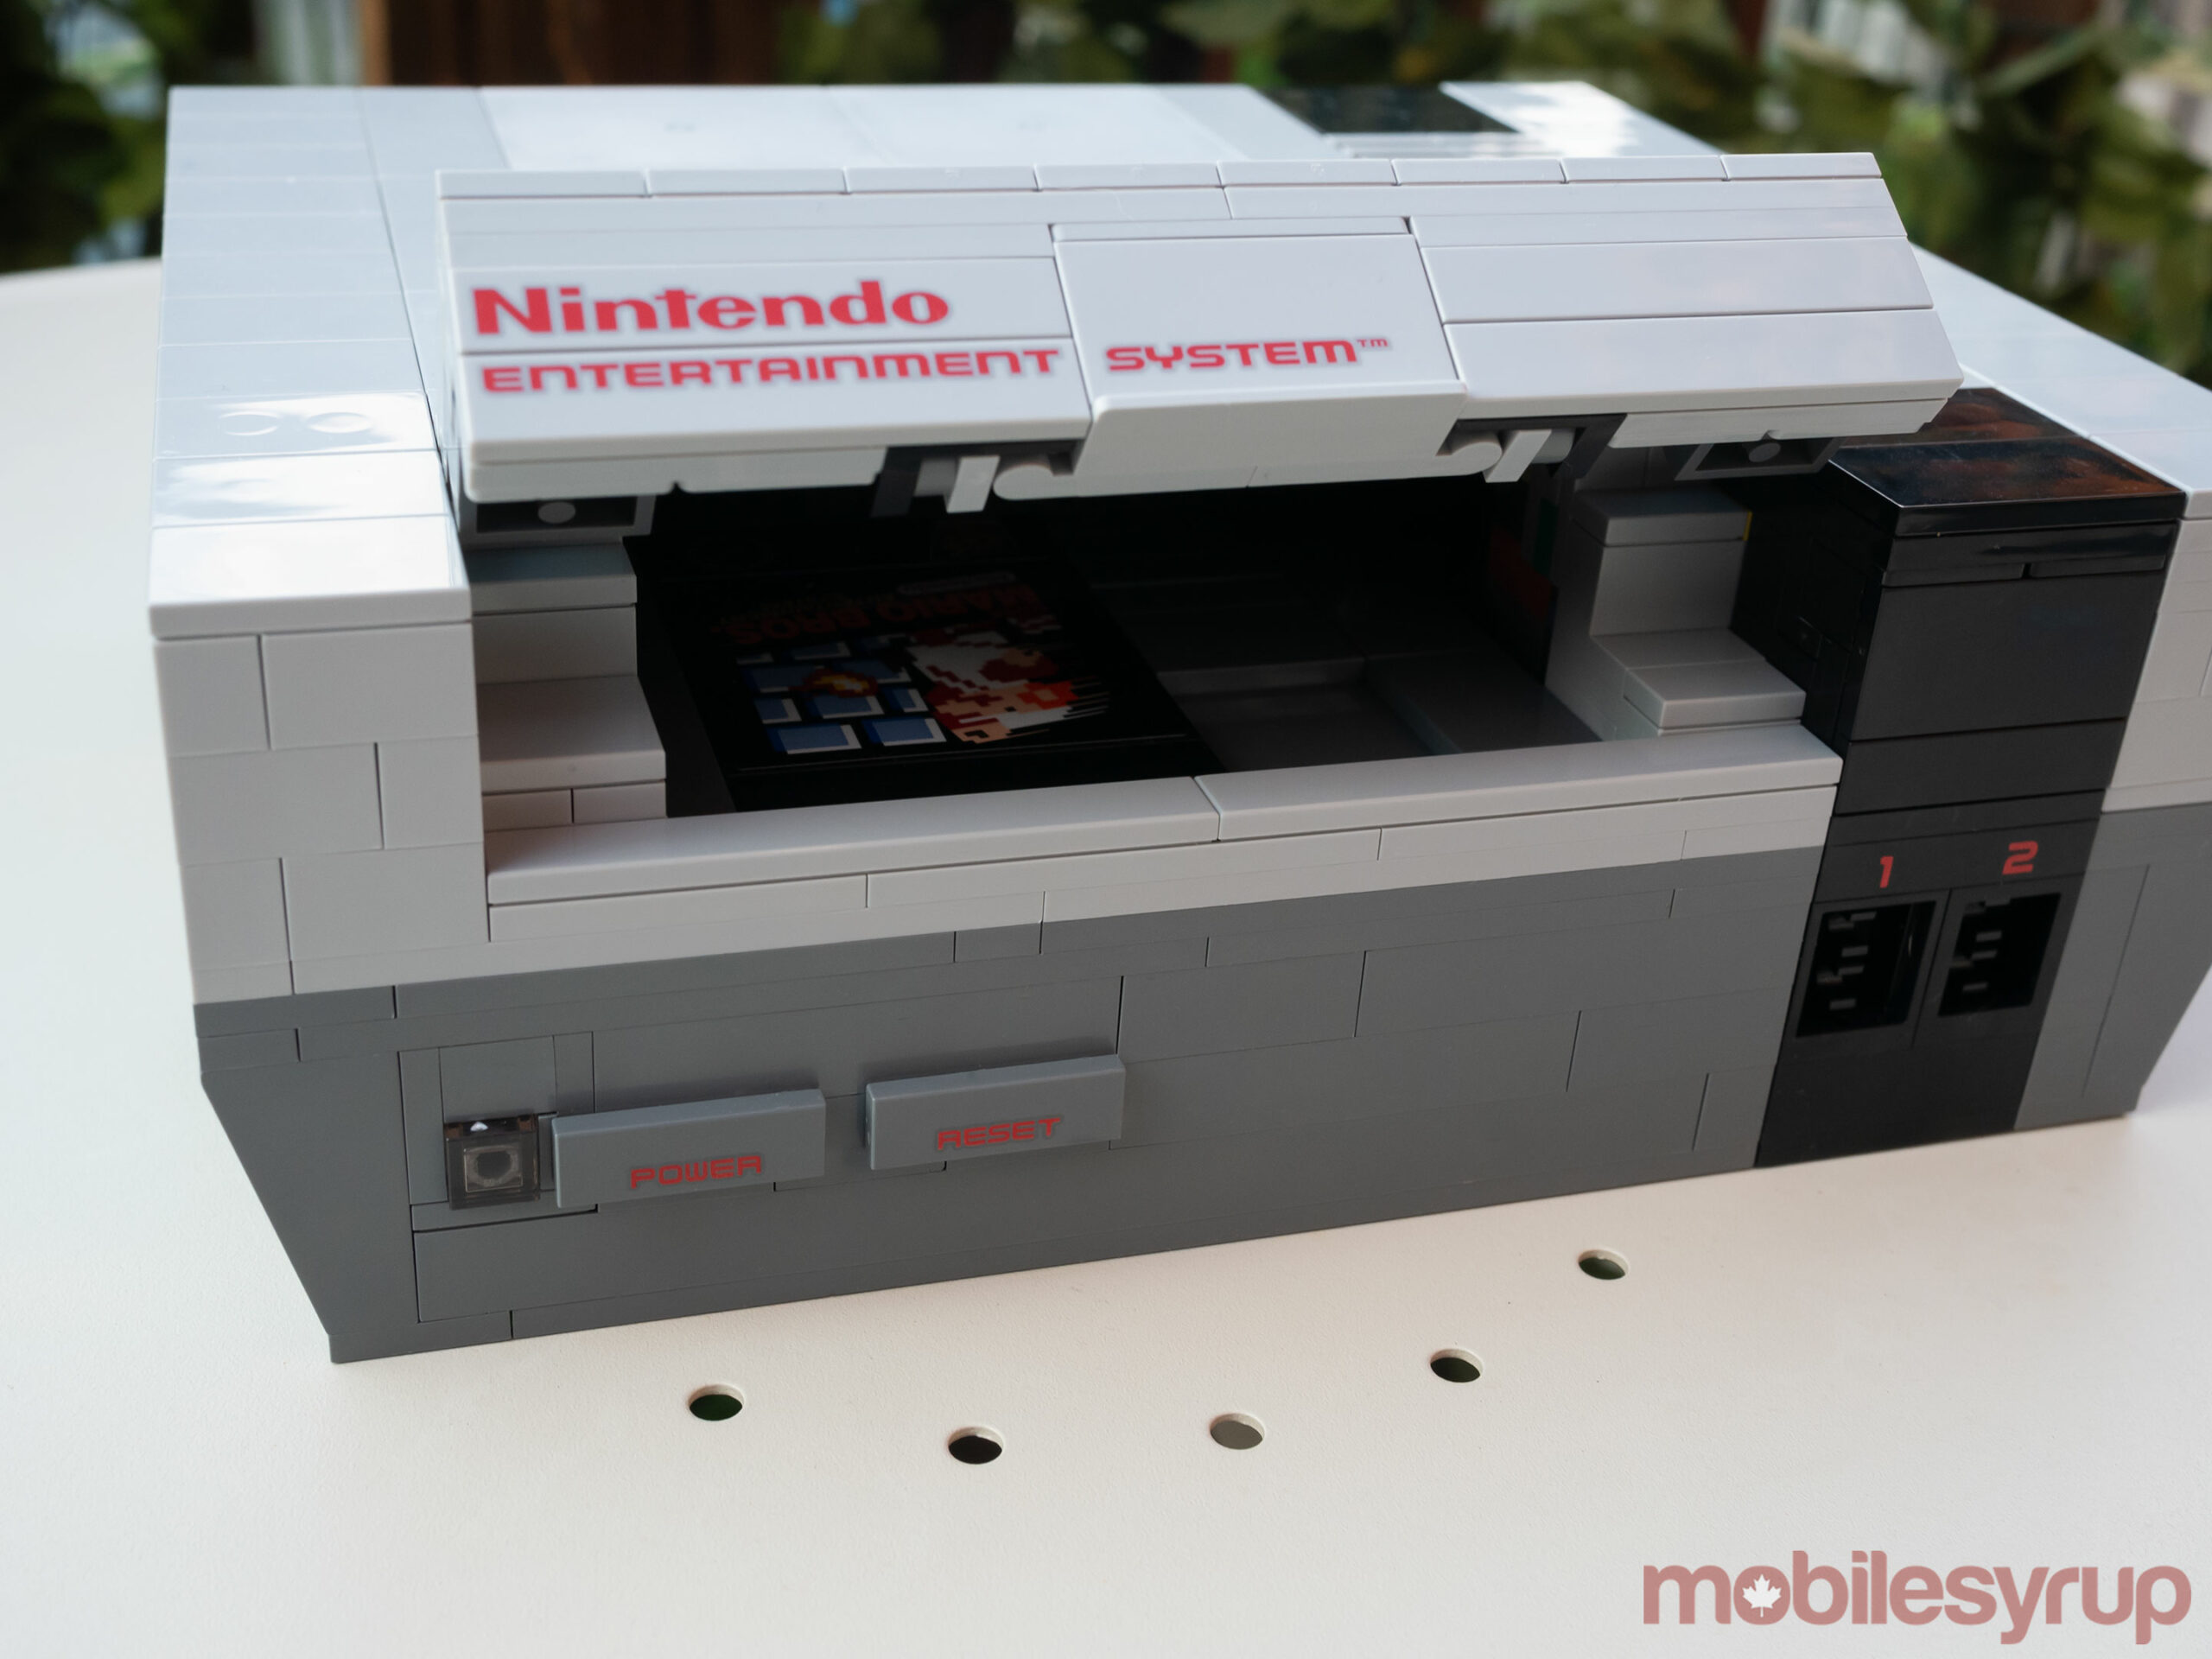 NES Lego with cartridge slot open